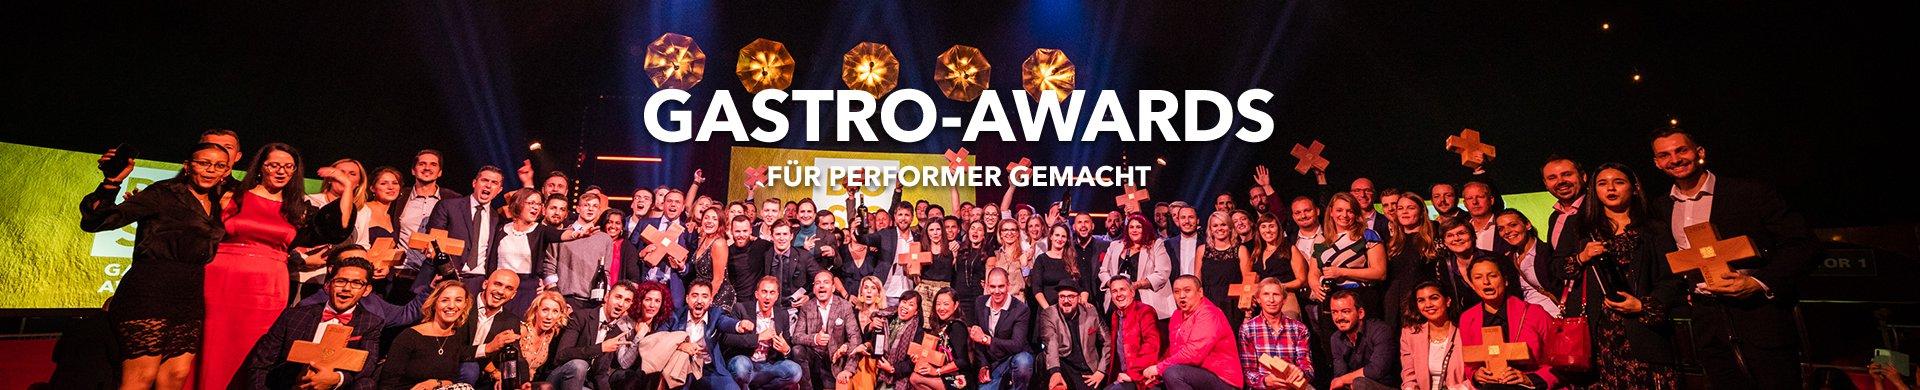 best-of-swiss-gastro-award-night-header-2019-1920x390